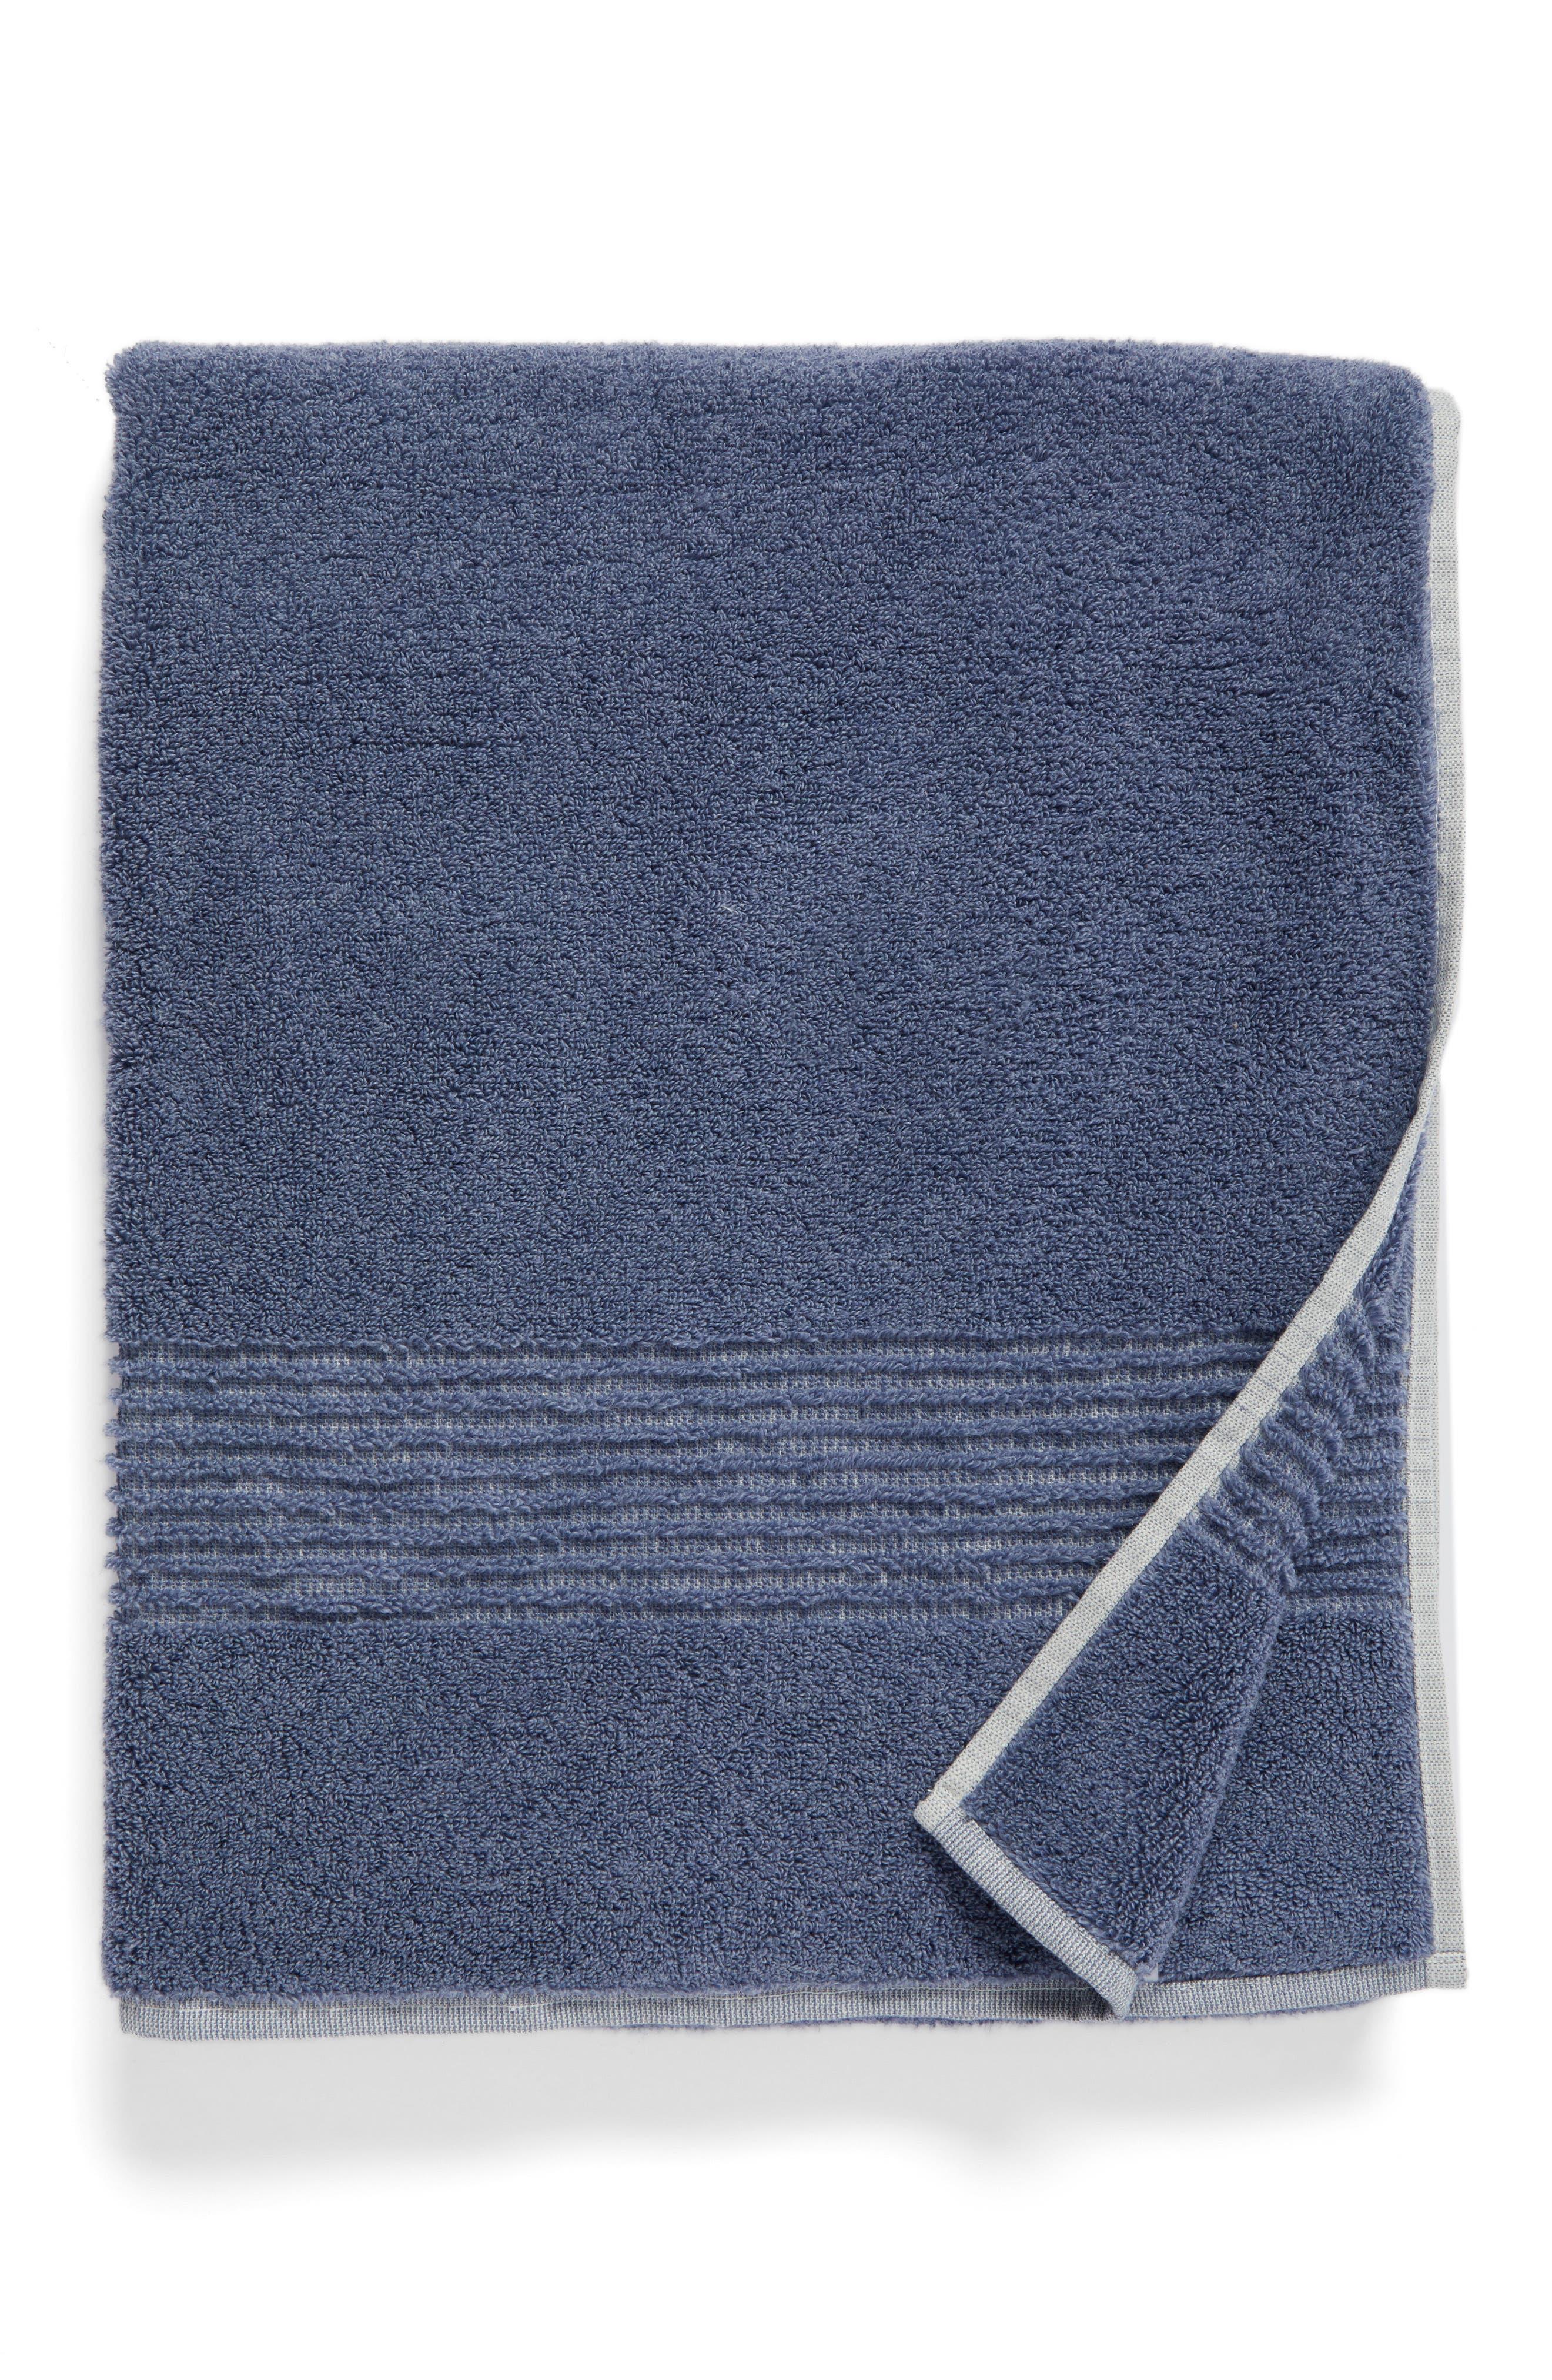 Organic Hydrocotton Bath Towel,                         Main,                         color, Navy Sky